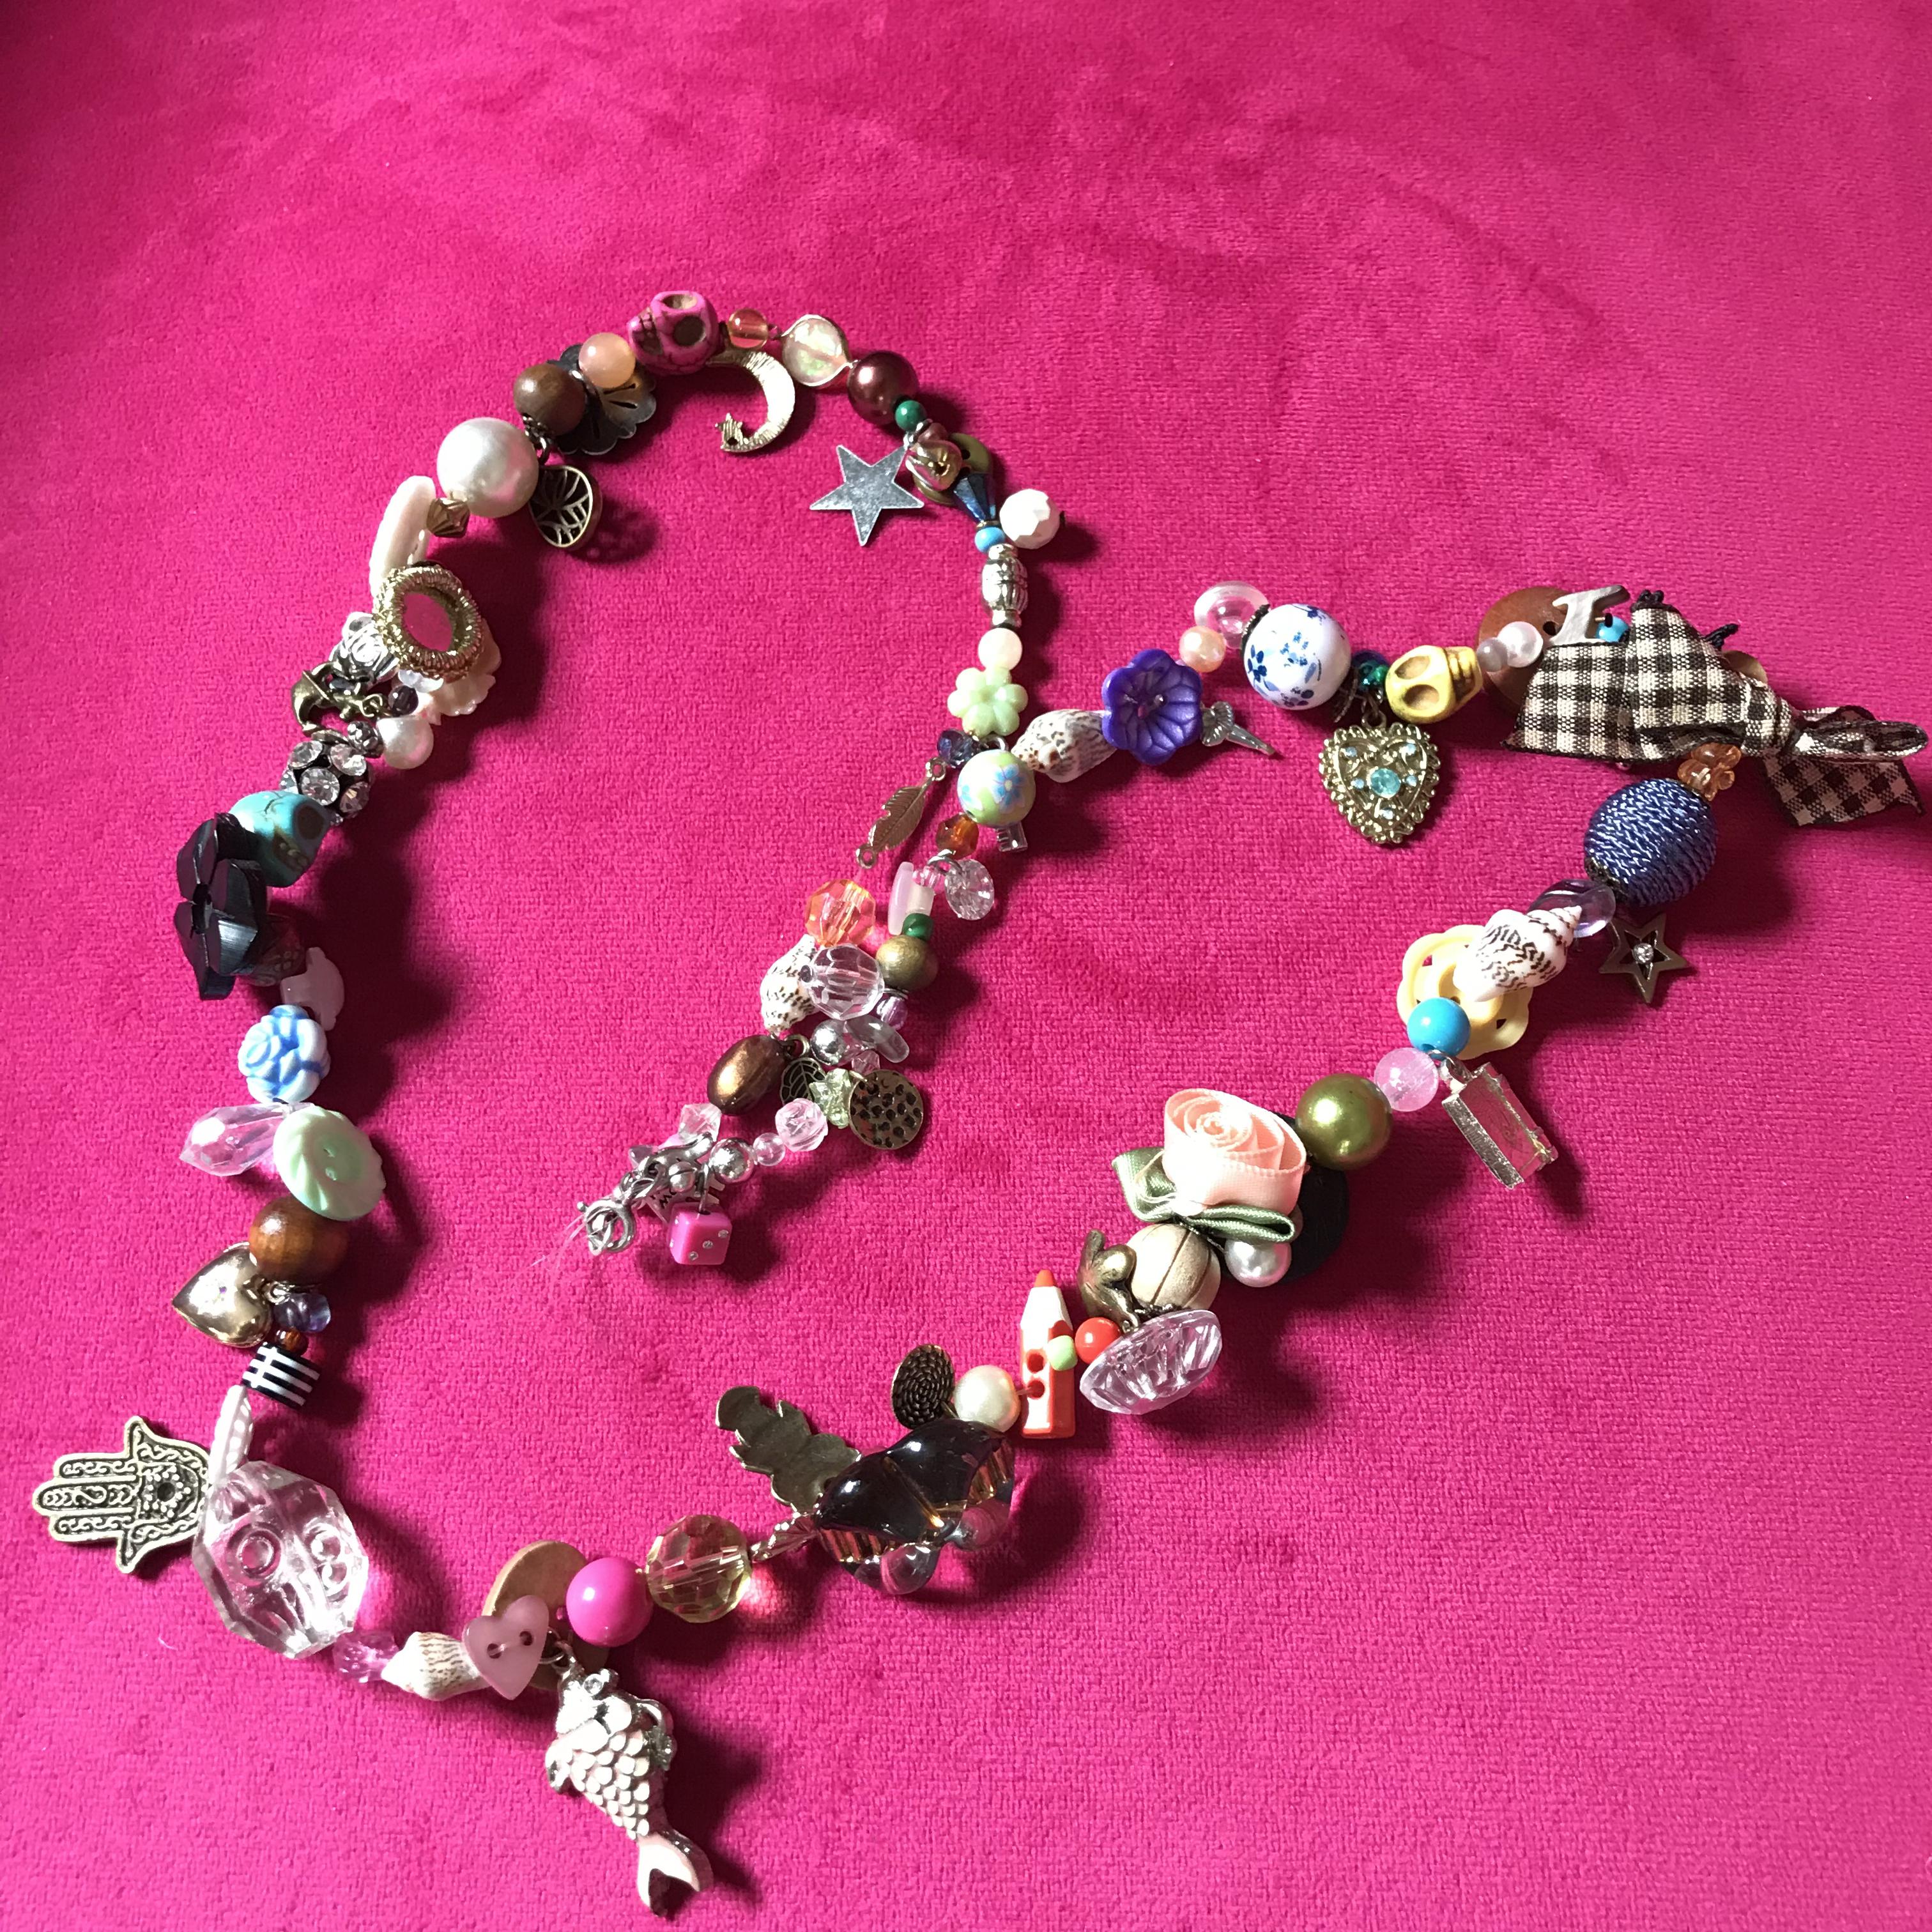 'Magpie' Necklace workshop  12-8-21